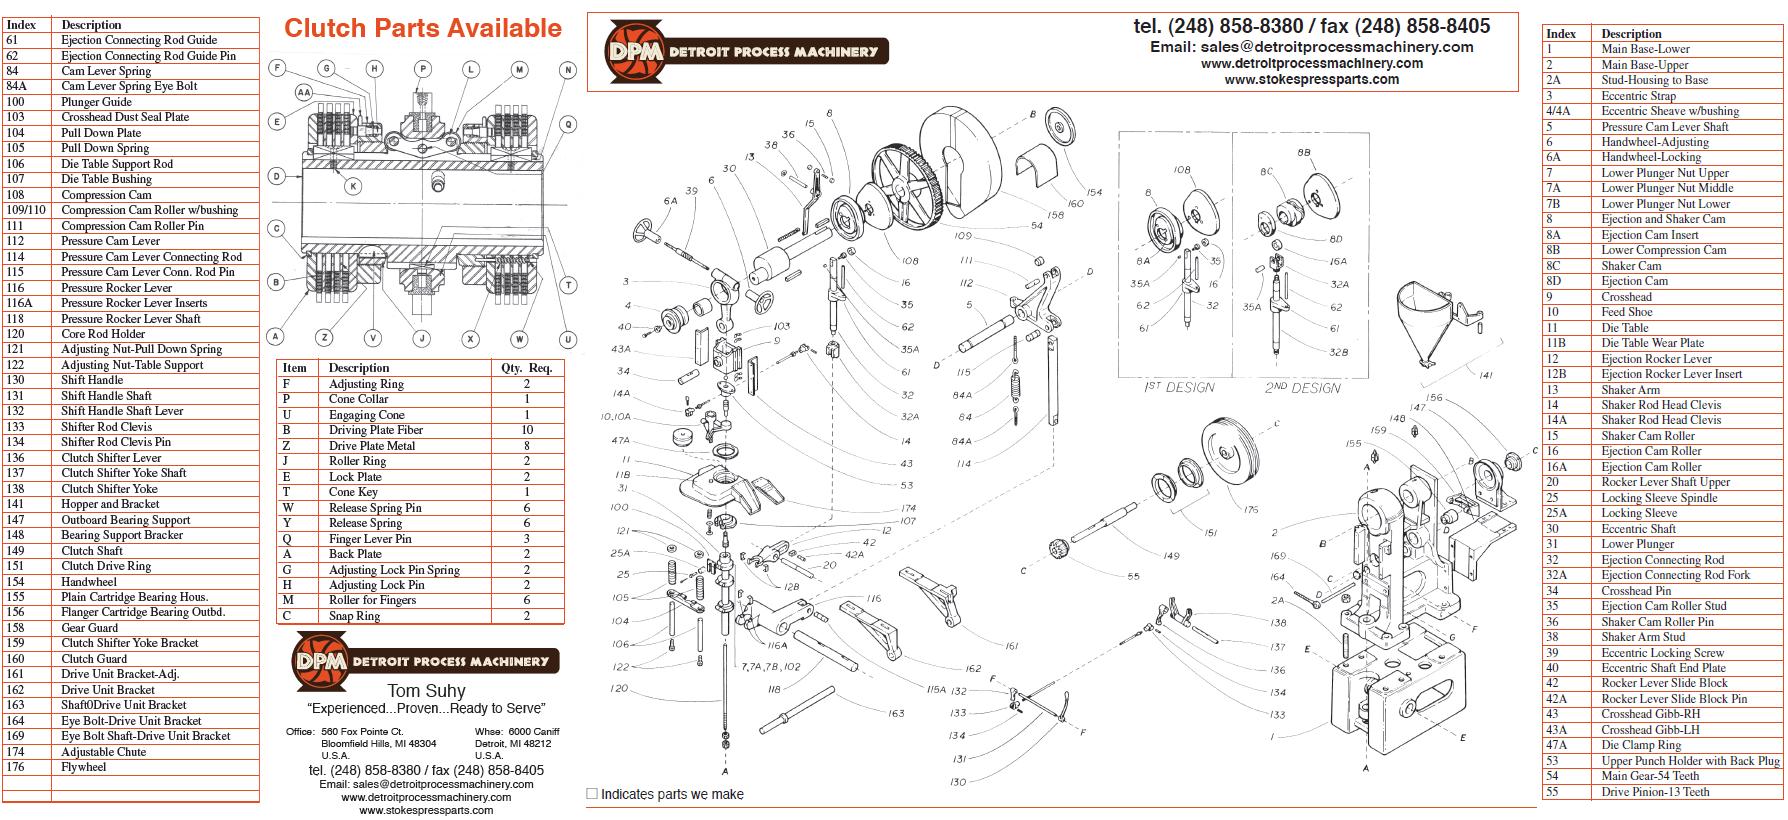 Stokes Parts Brochure